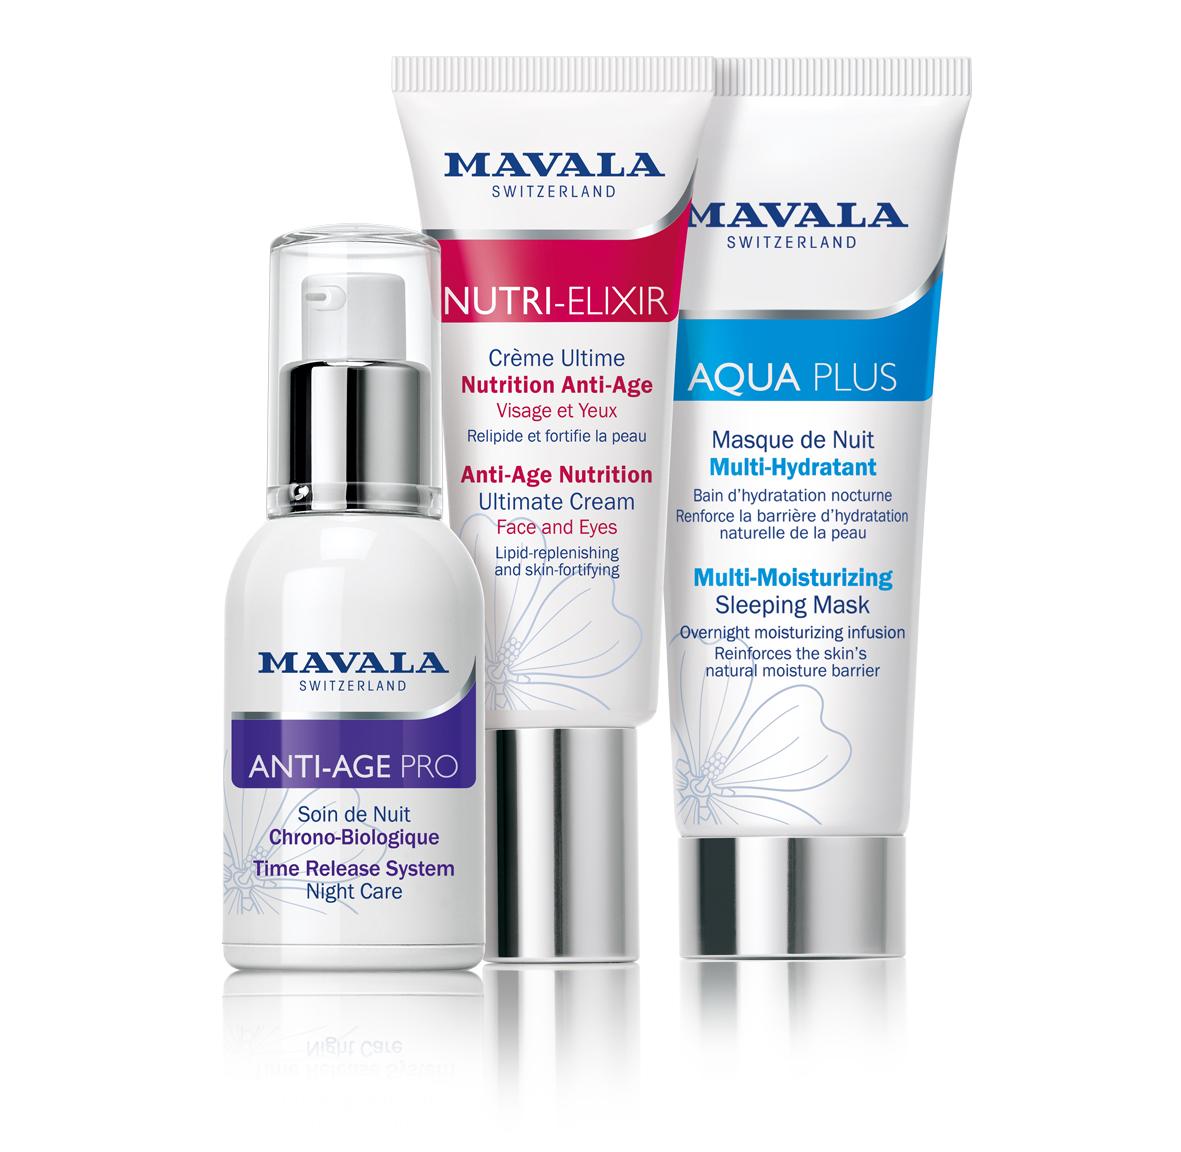 MAVALA-Swiss-Skin-Solution-packagings